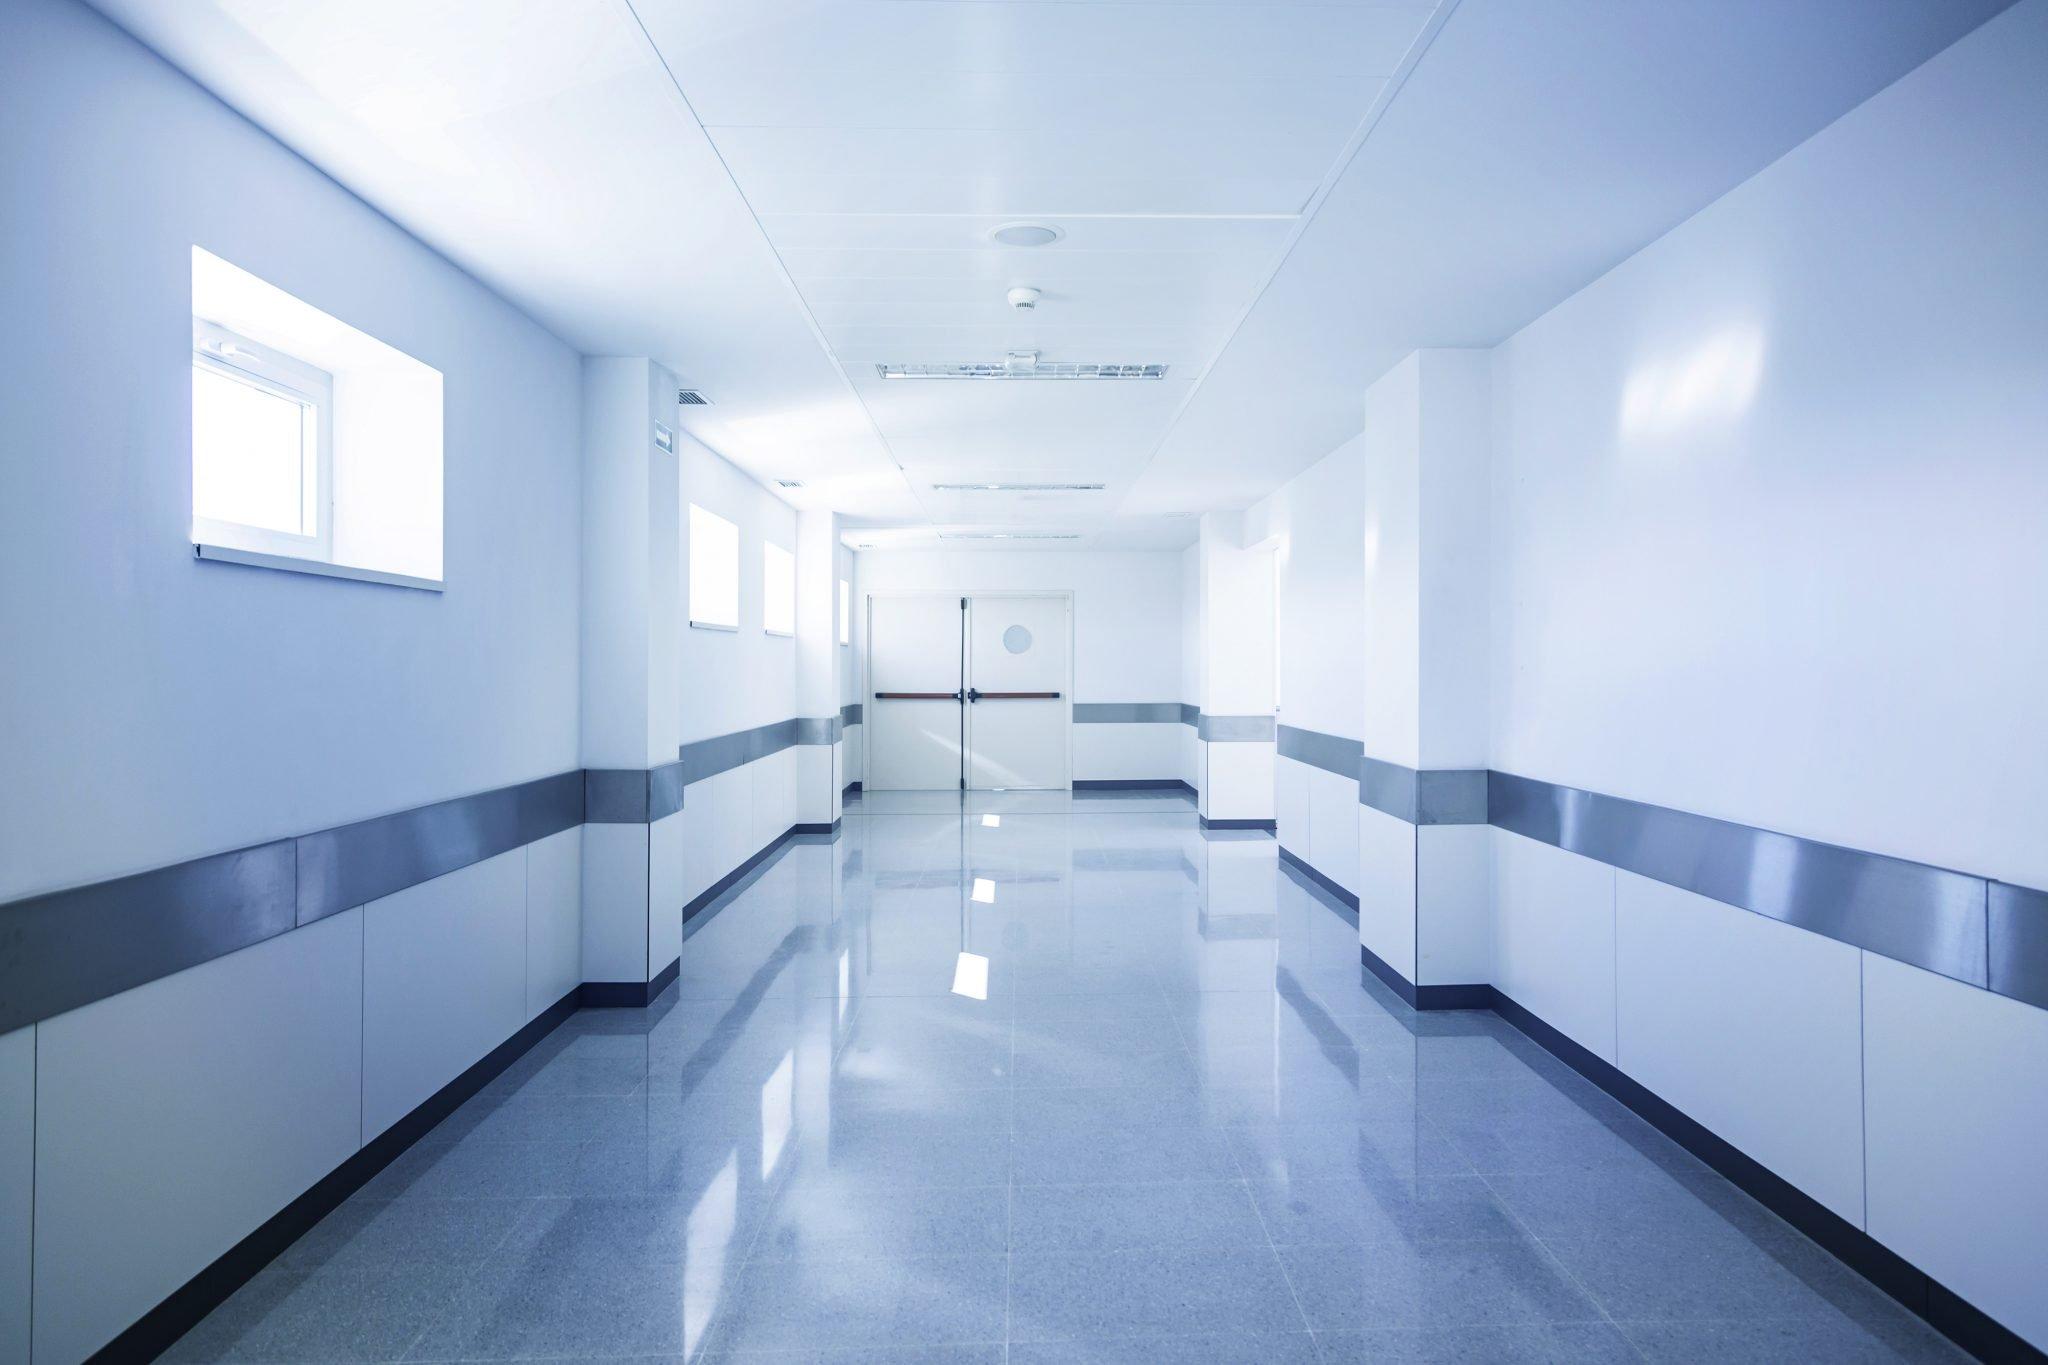 Los Angeles hospital malpractice attorney